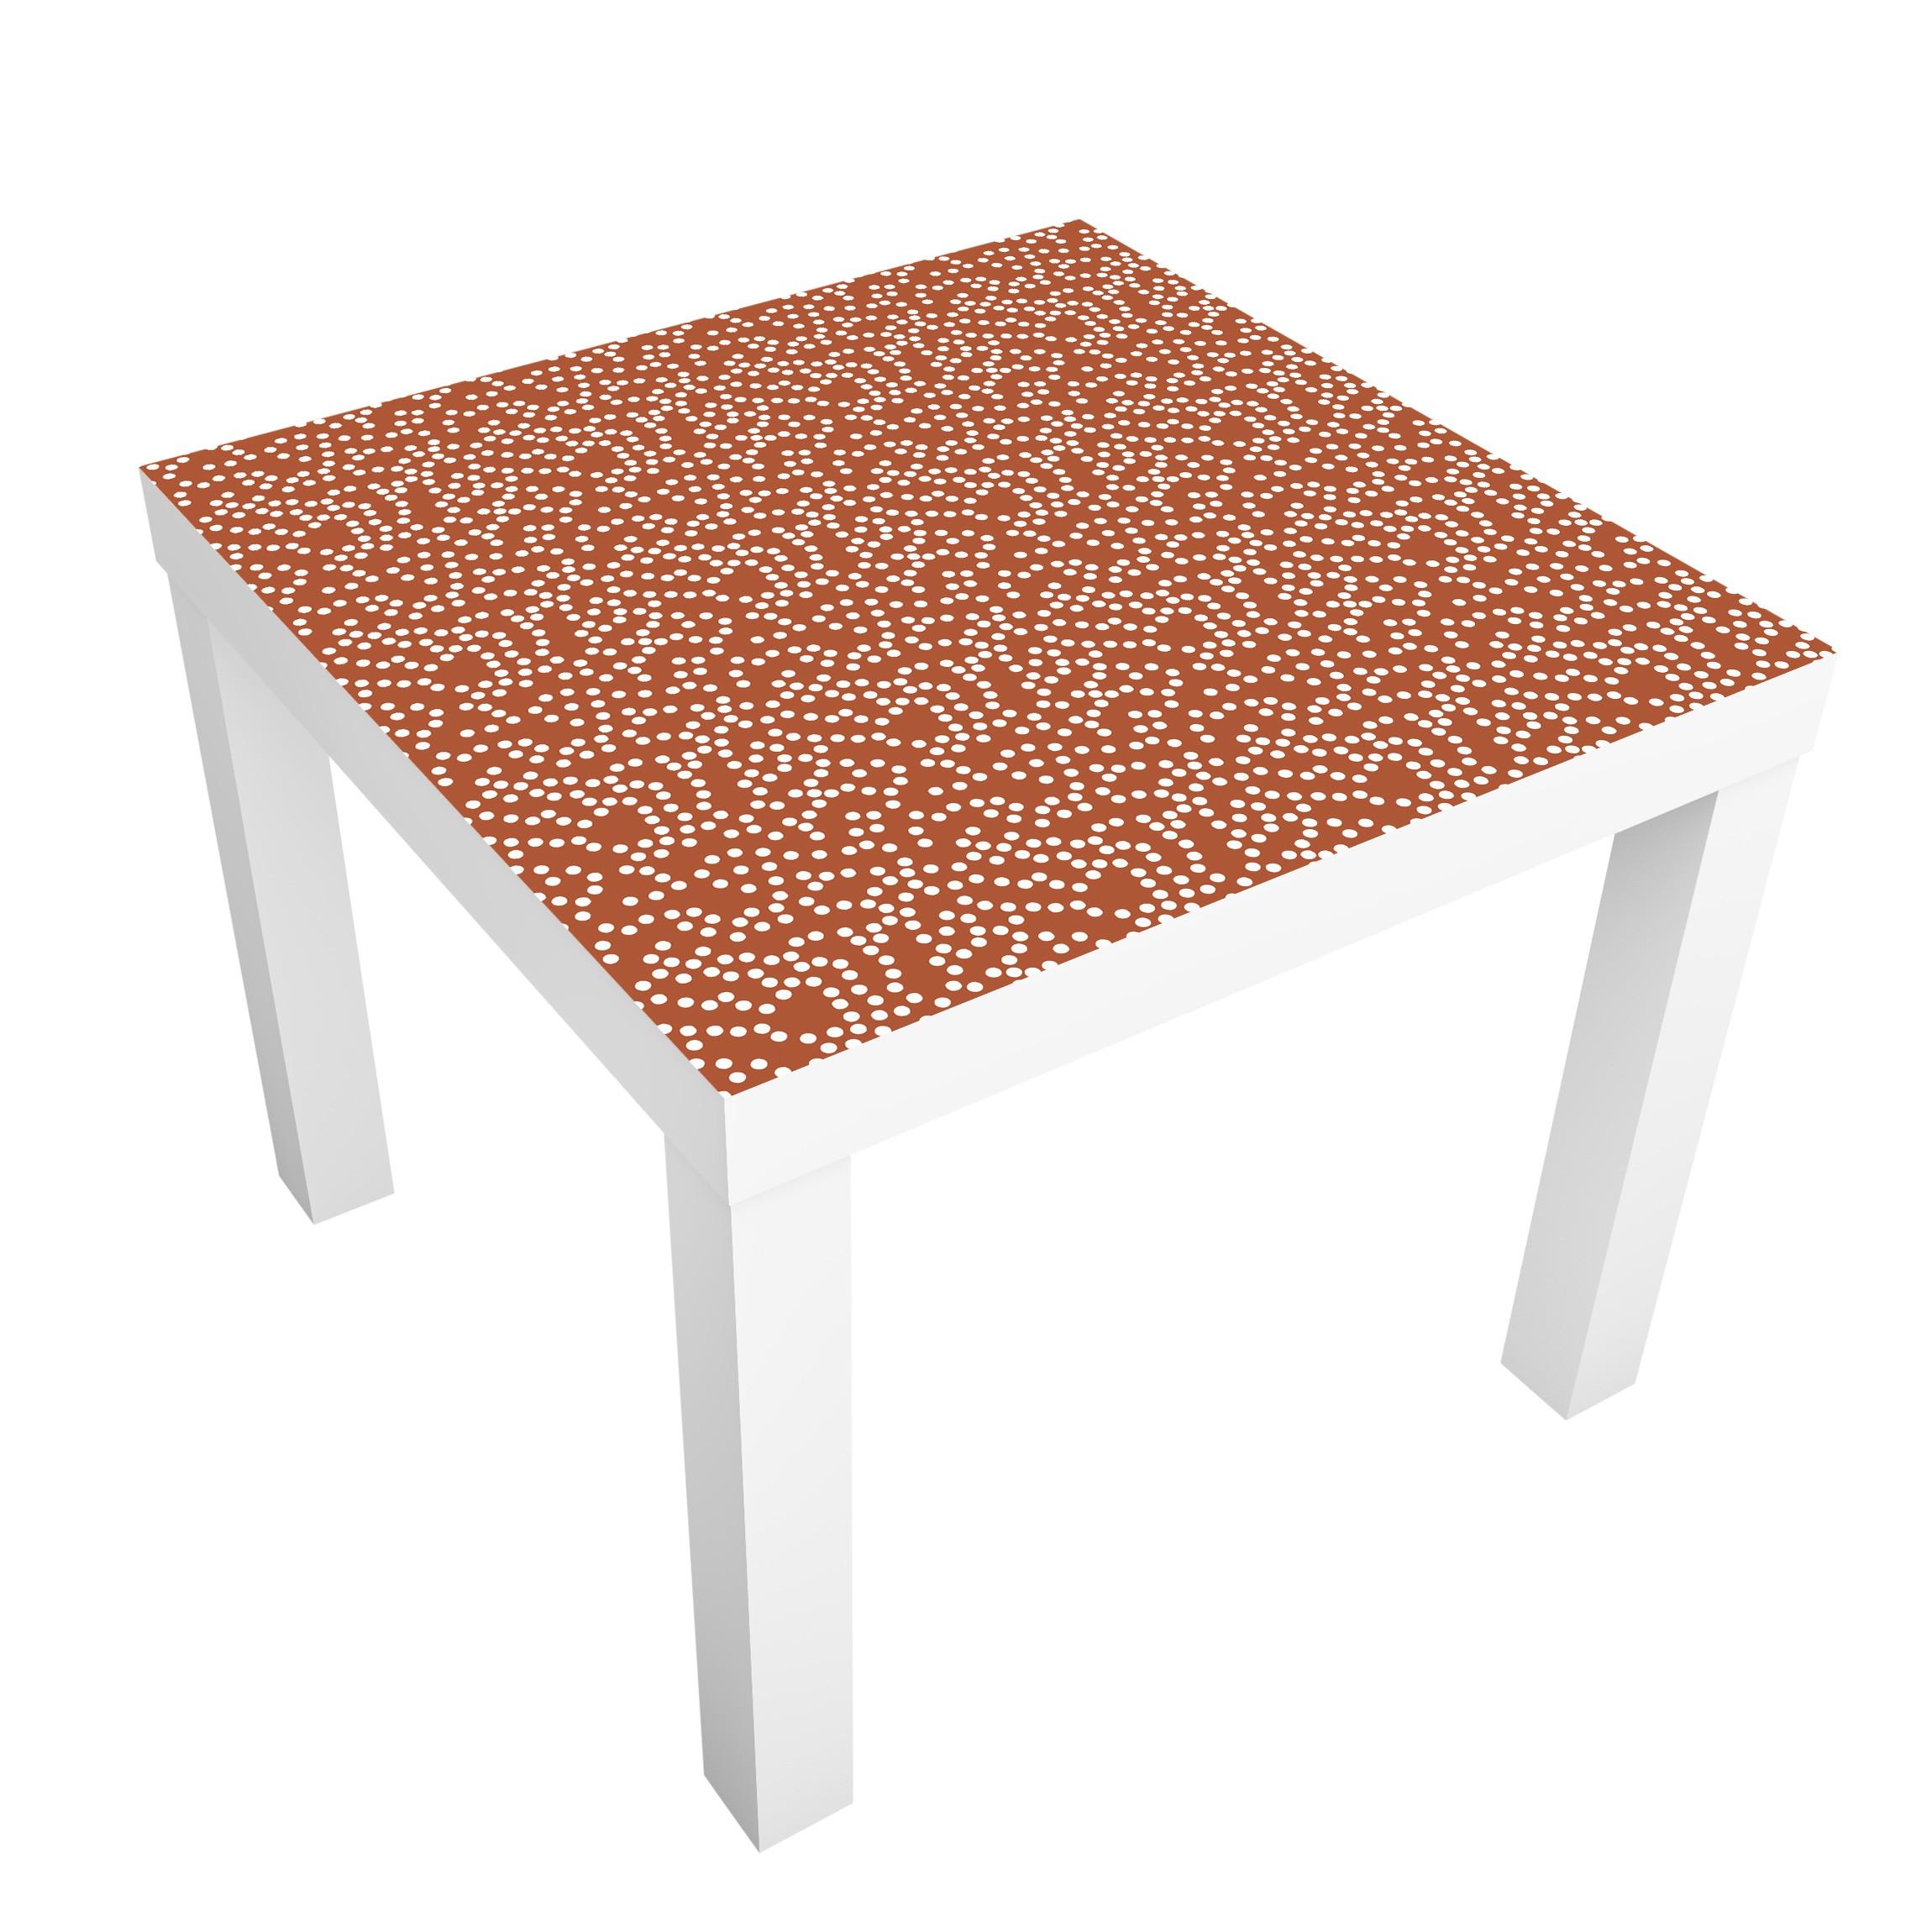 Carta adesiva per mobili ikea lack tavolino aboriginal dot pattern brown - Ikea lack tavolino ...